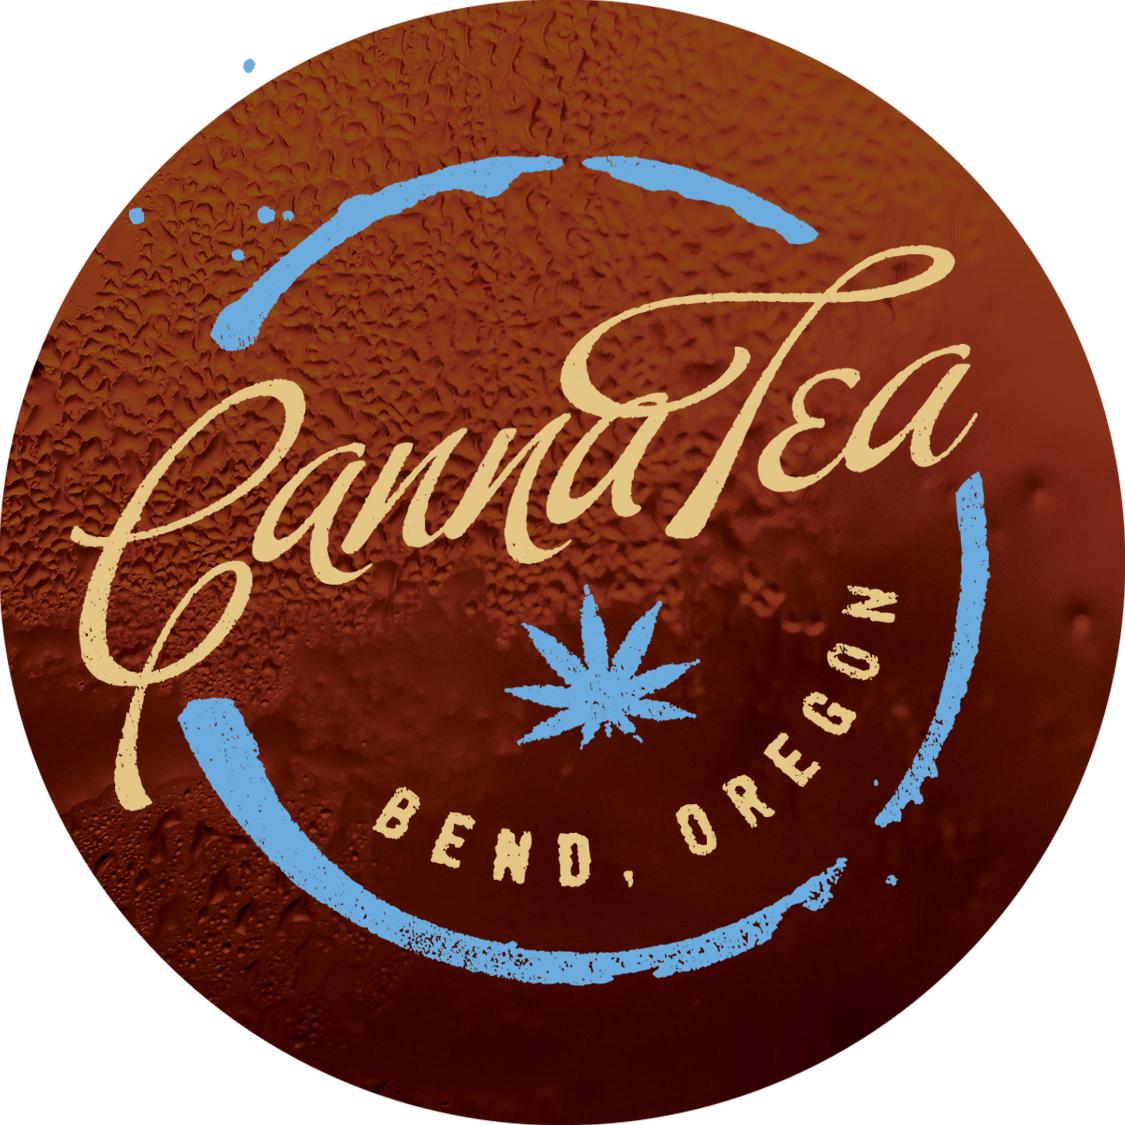 Canna Tea USA